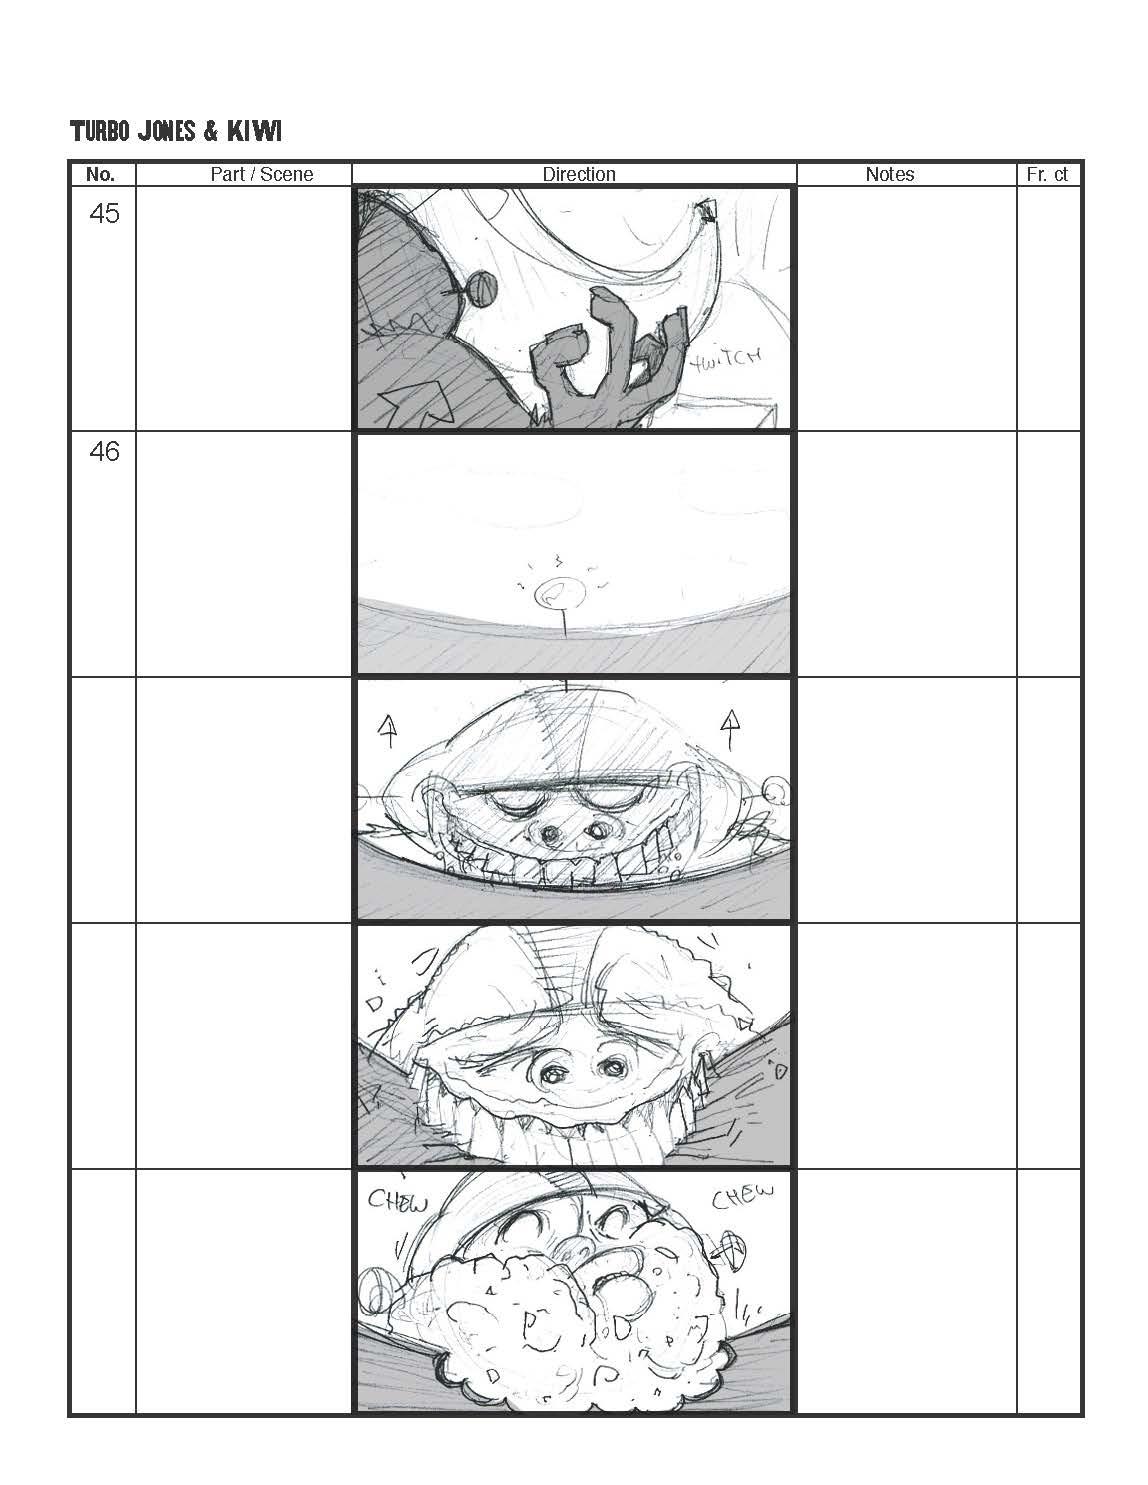 TJK_Storyboards_v01_HIGH_Page_24.jpg